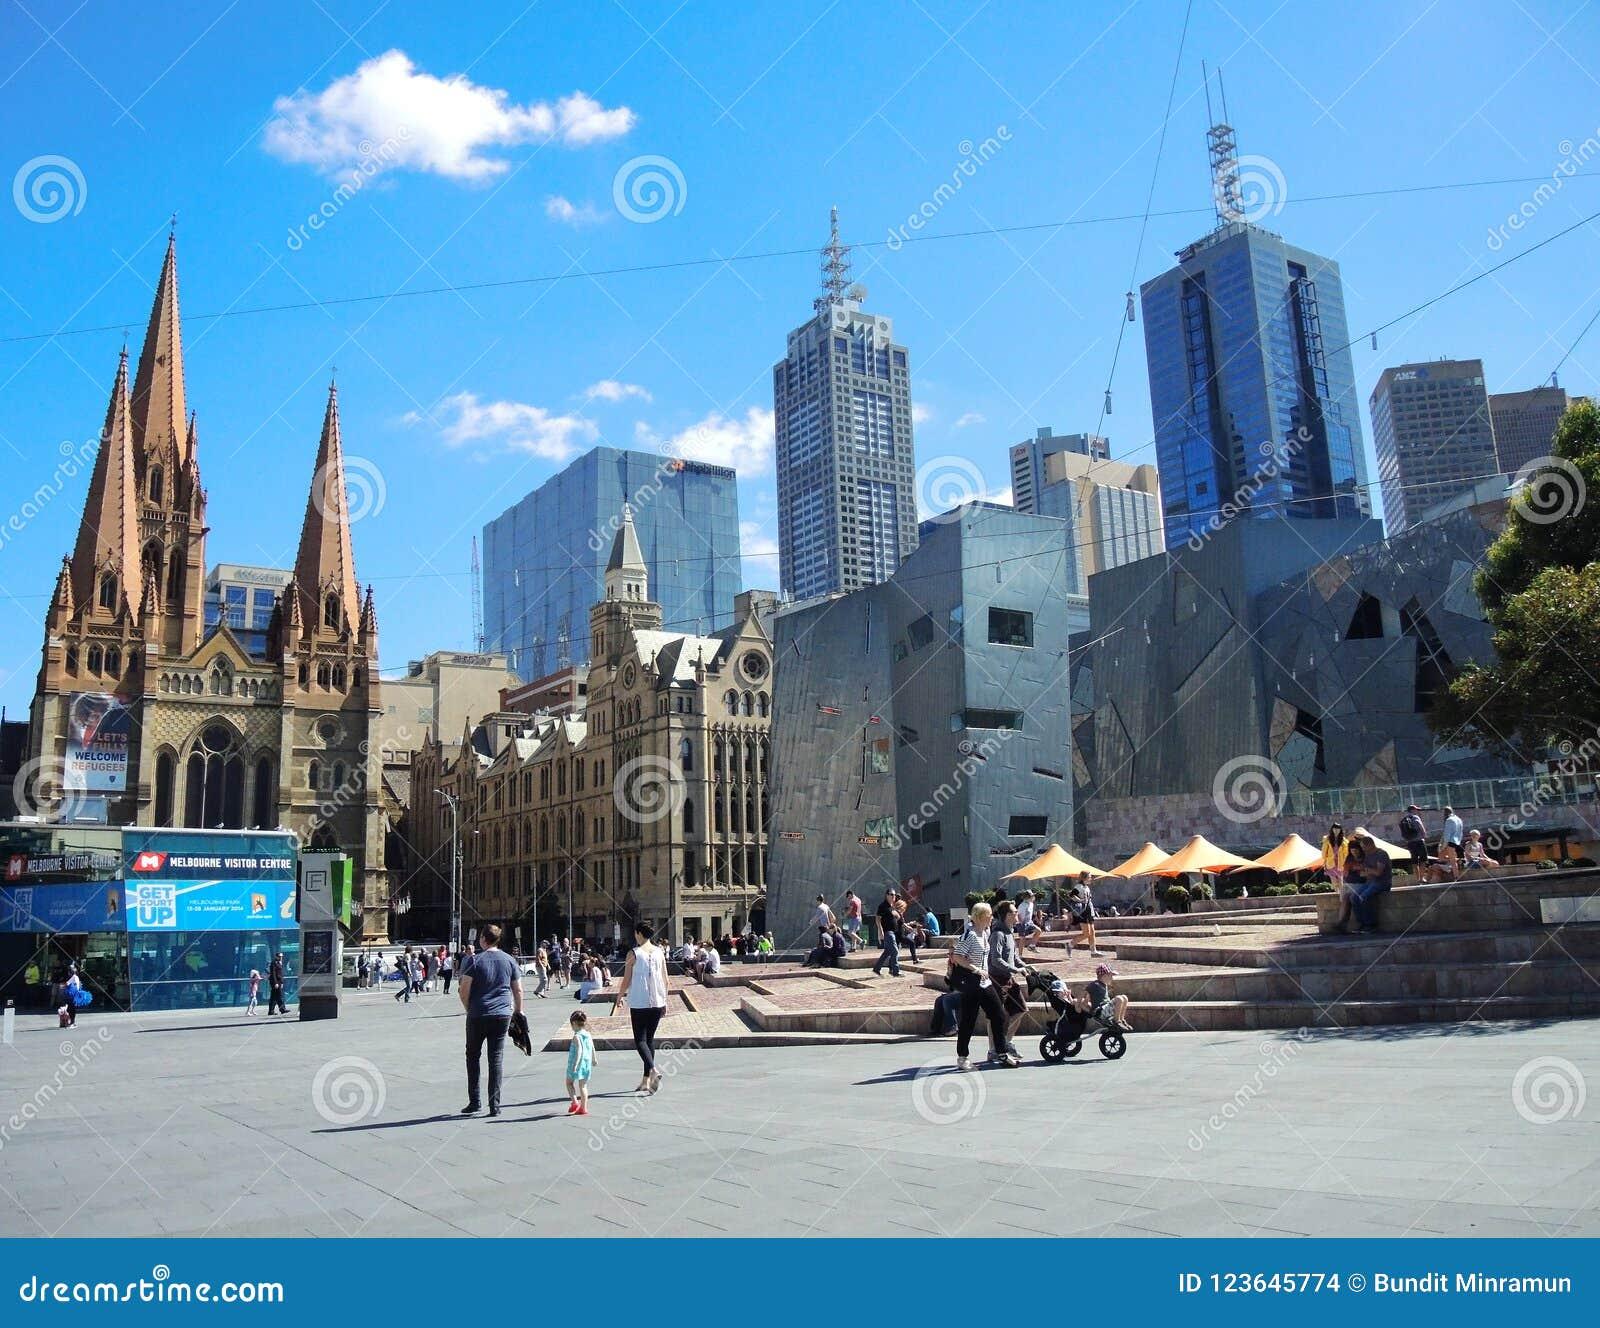 The Visitors Centre in Federation Square in the CBD of Melbourne.